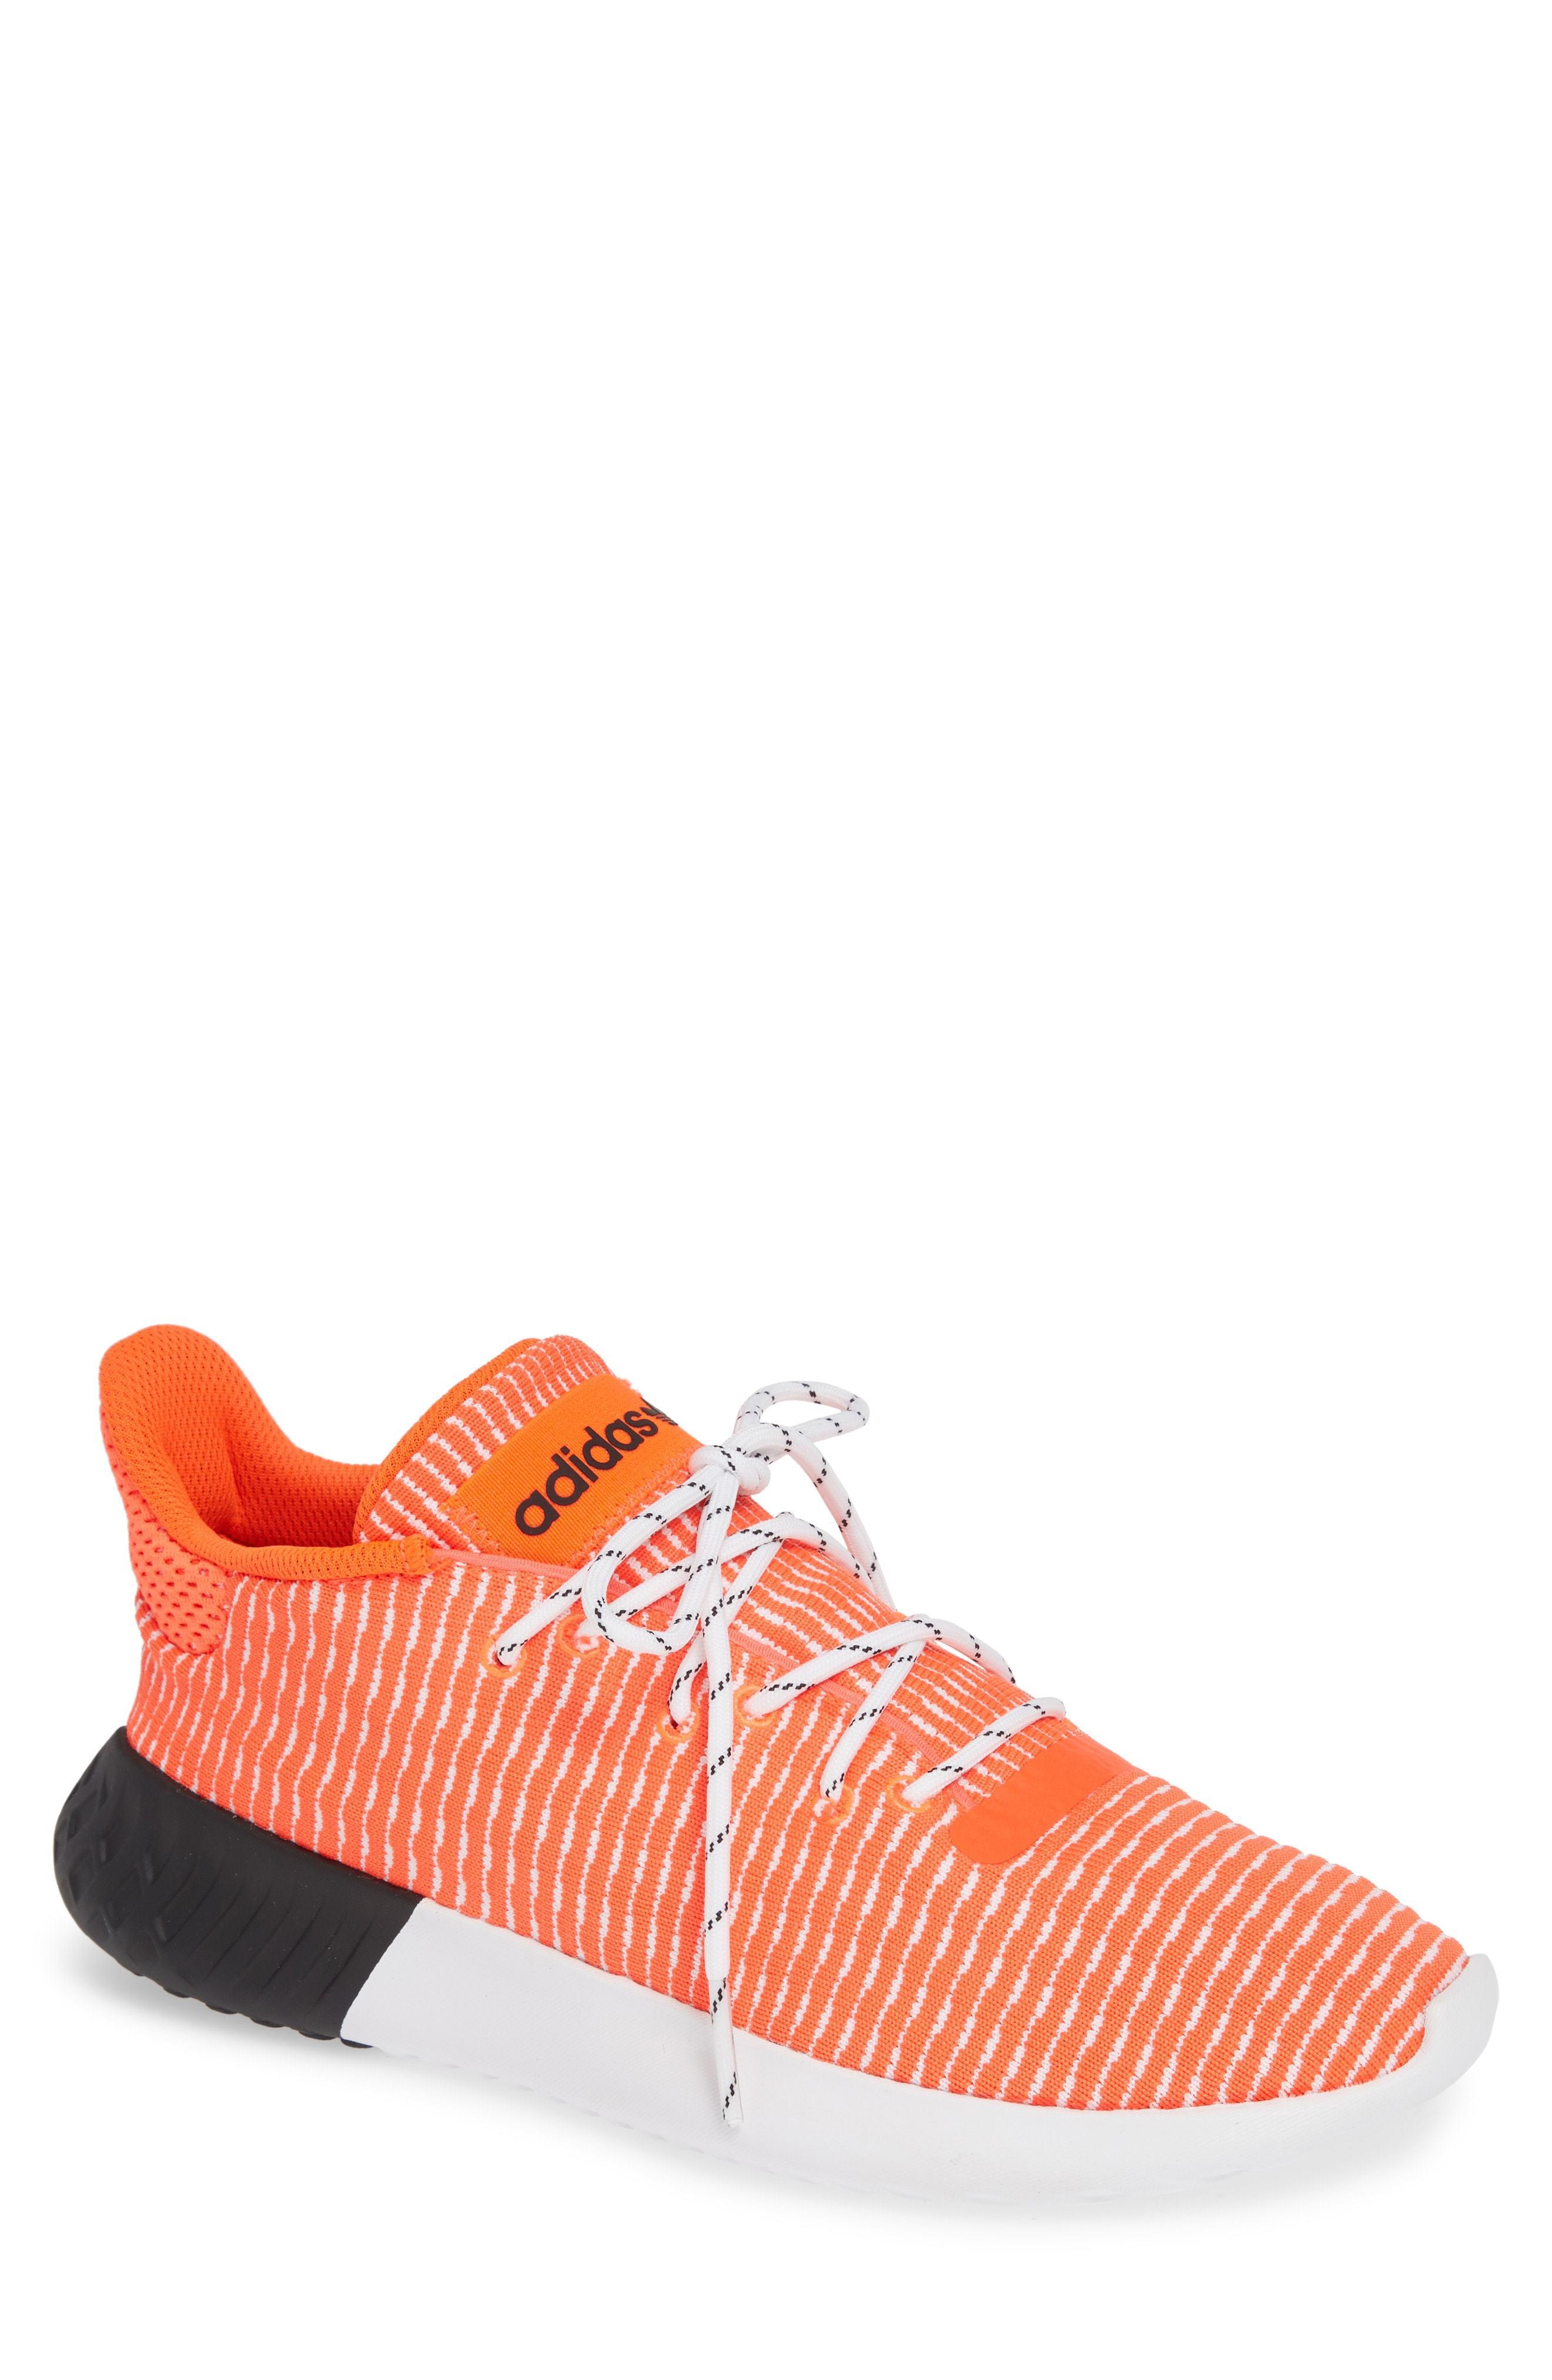 f0b05a5e18d ... Orange Athletic Shoes adidas Tubular Dusk Primeknit Sneaker